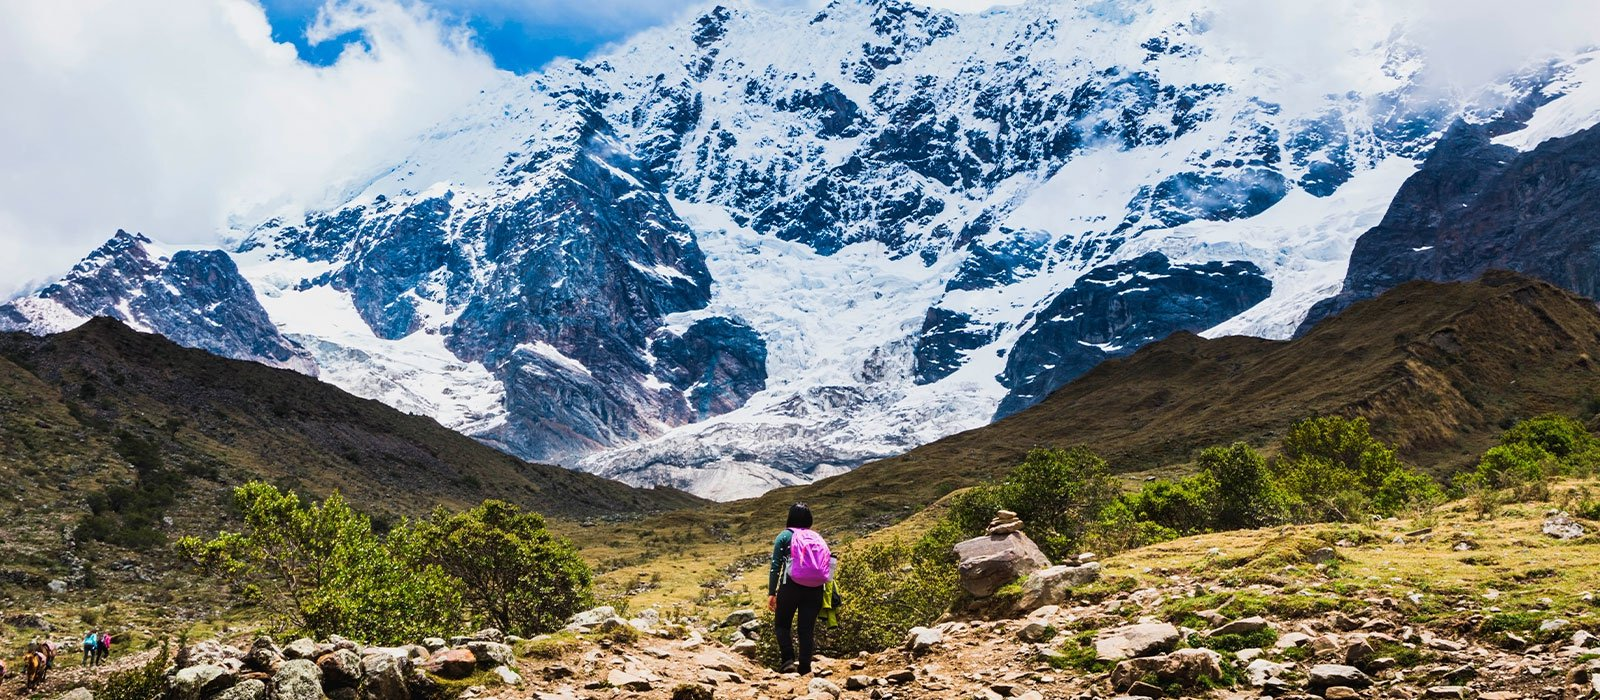 Salkantay Trek and Inca Trail to Machu Picchu